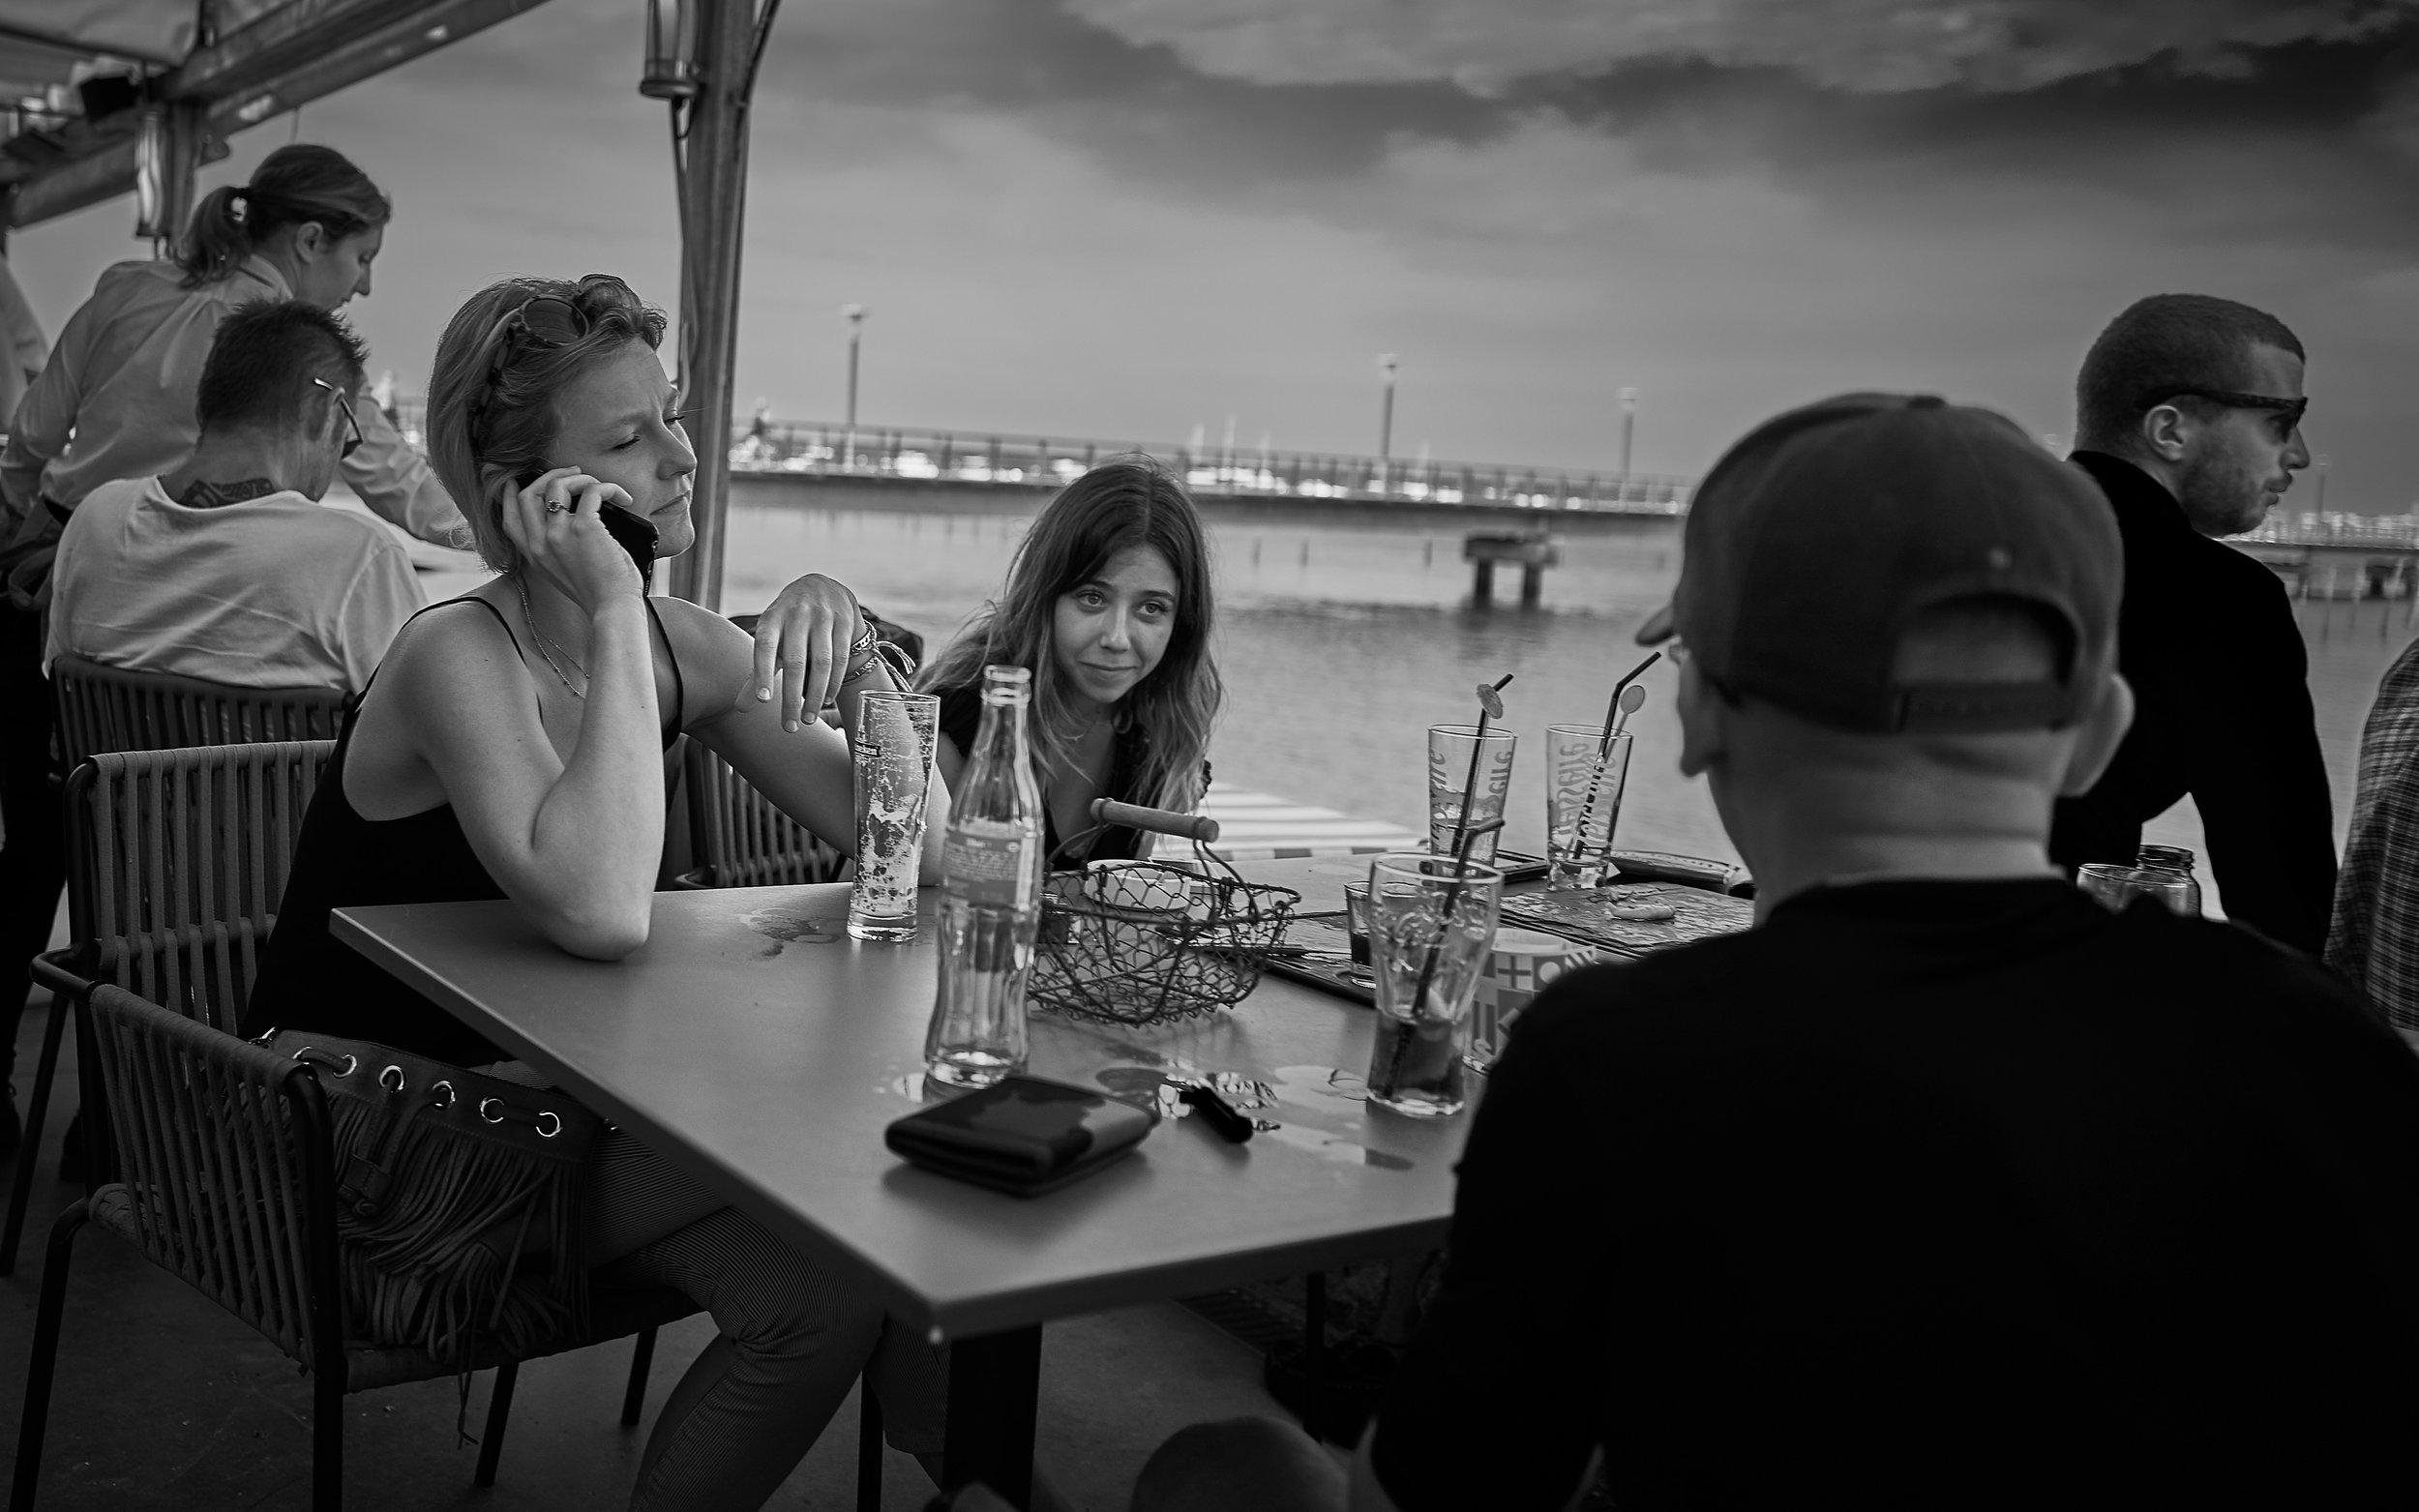 Regard d'une conversation // Cap-Ferret // juillet 2017 // Leica